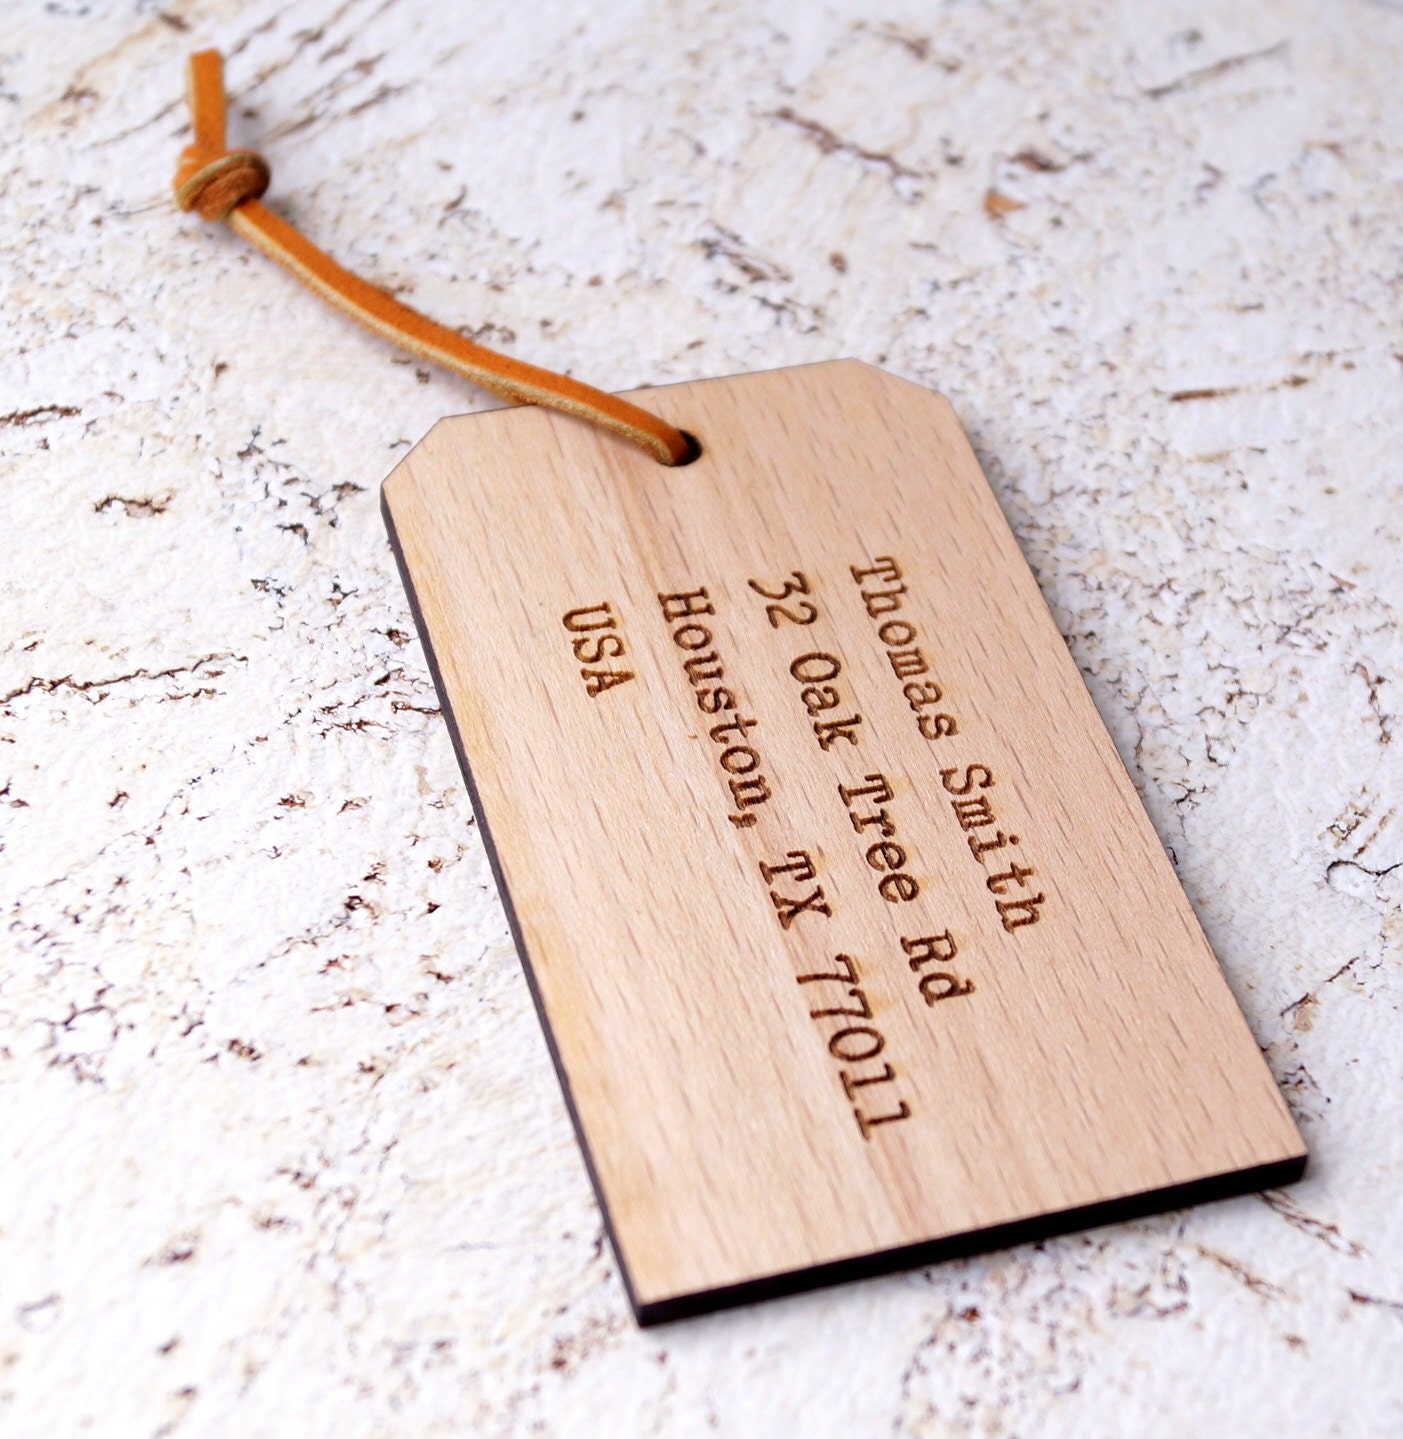 Personalized Luggage Tags Wedding Gift: Custom Luggage Tag Personalized Wooden Laser Engraved Luggage